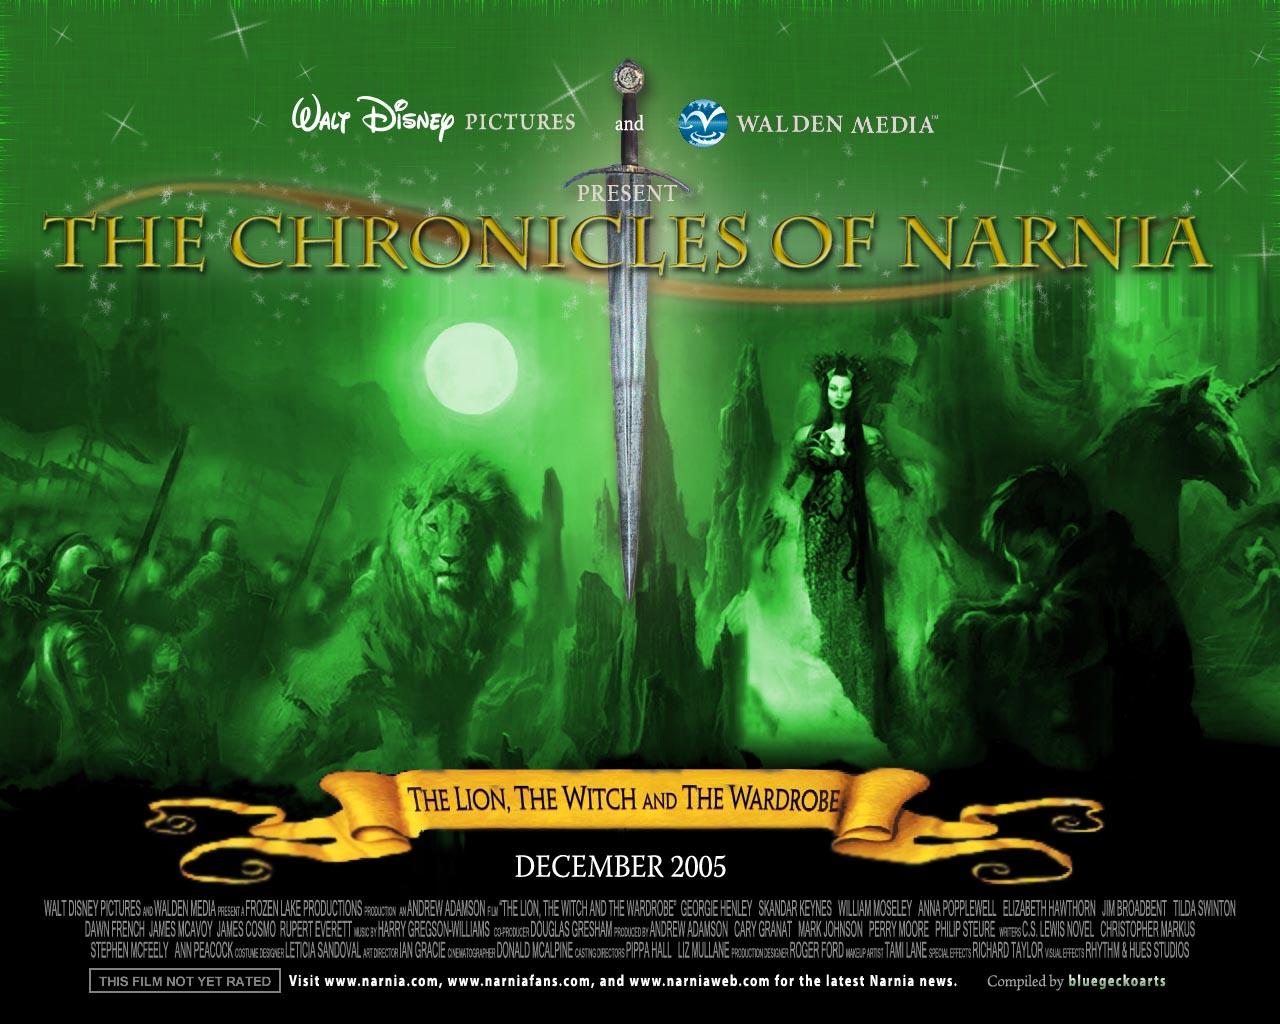 NarniaFans.com :: Narnian Fan Section :: Wallpaper